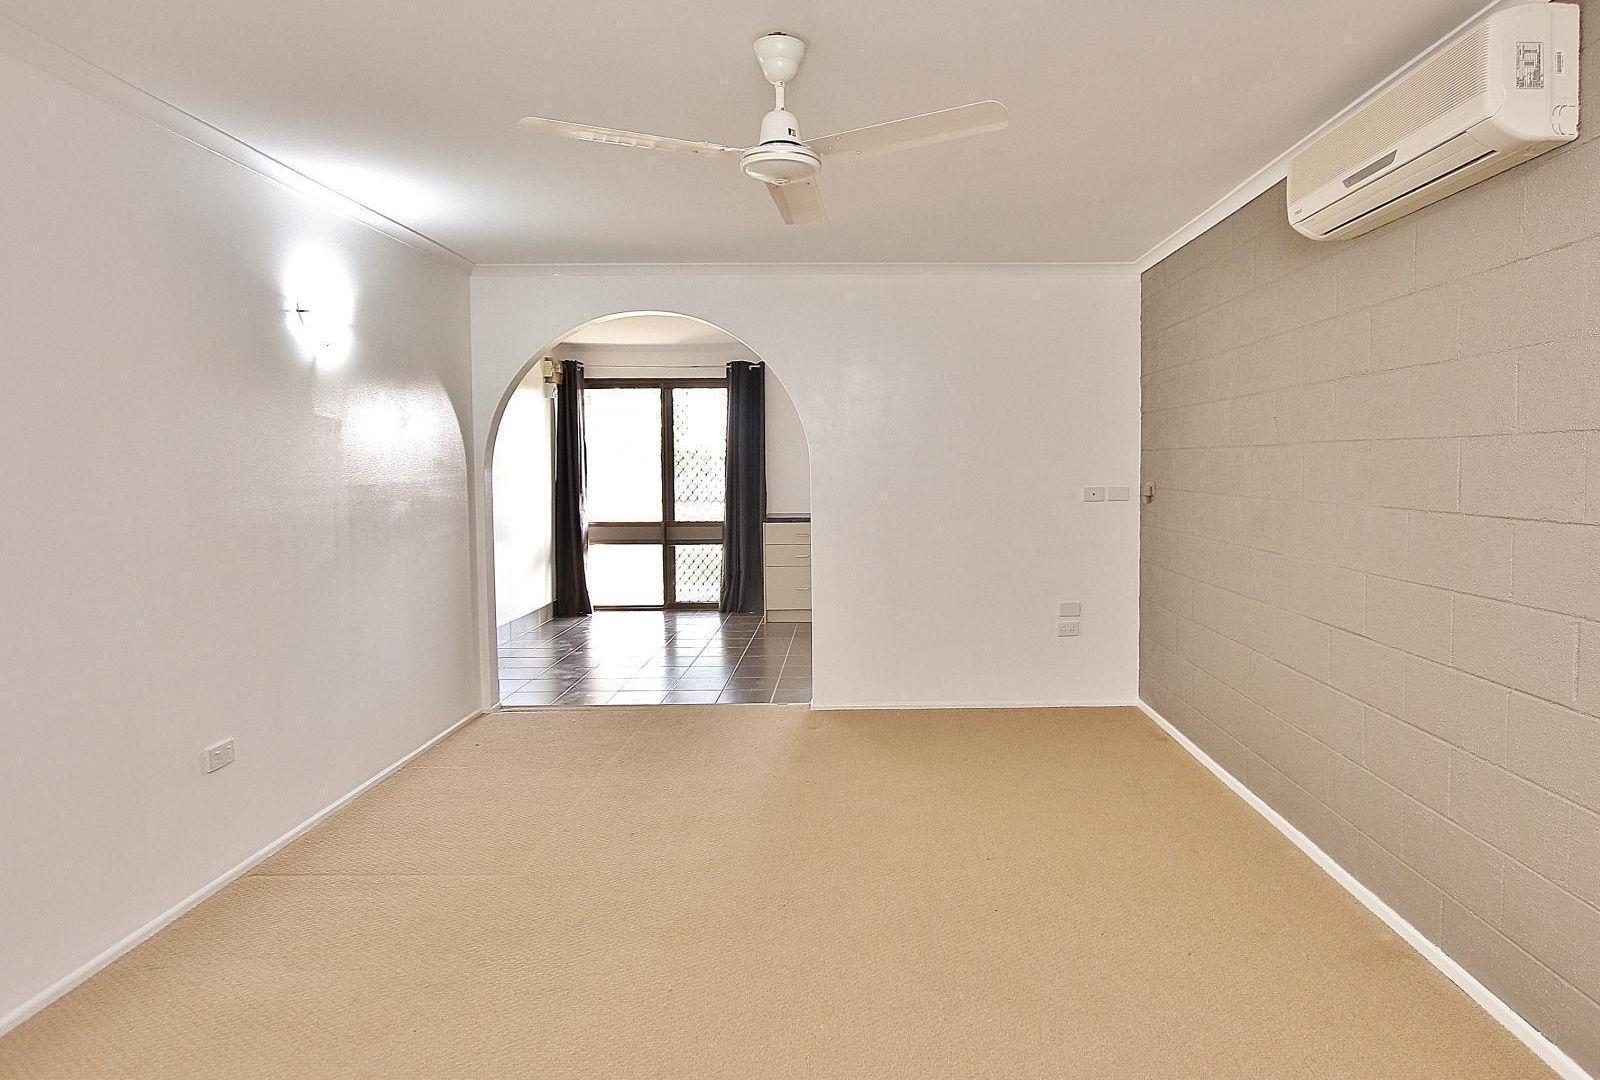 5/322 Warnock Street, Koongal QLD 4701, Image 1